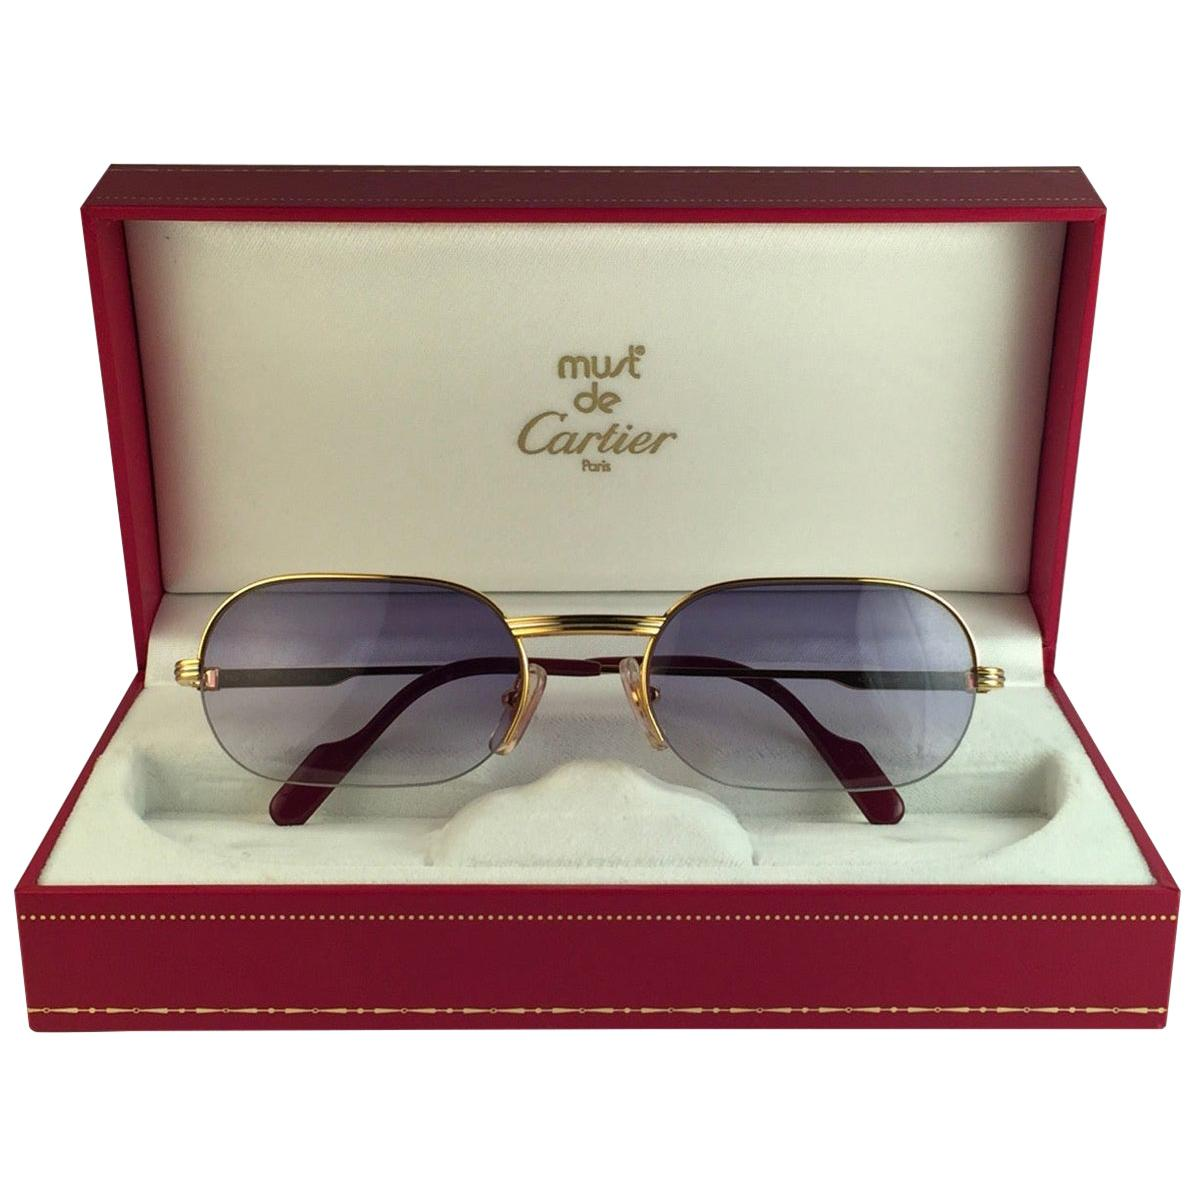 New Cartier Ascot Vendome Gold 53mm Half Frame Sunglasses Elton John France